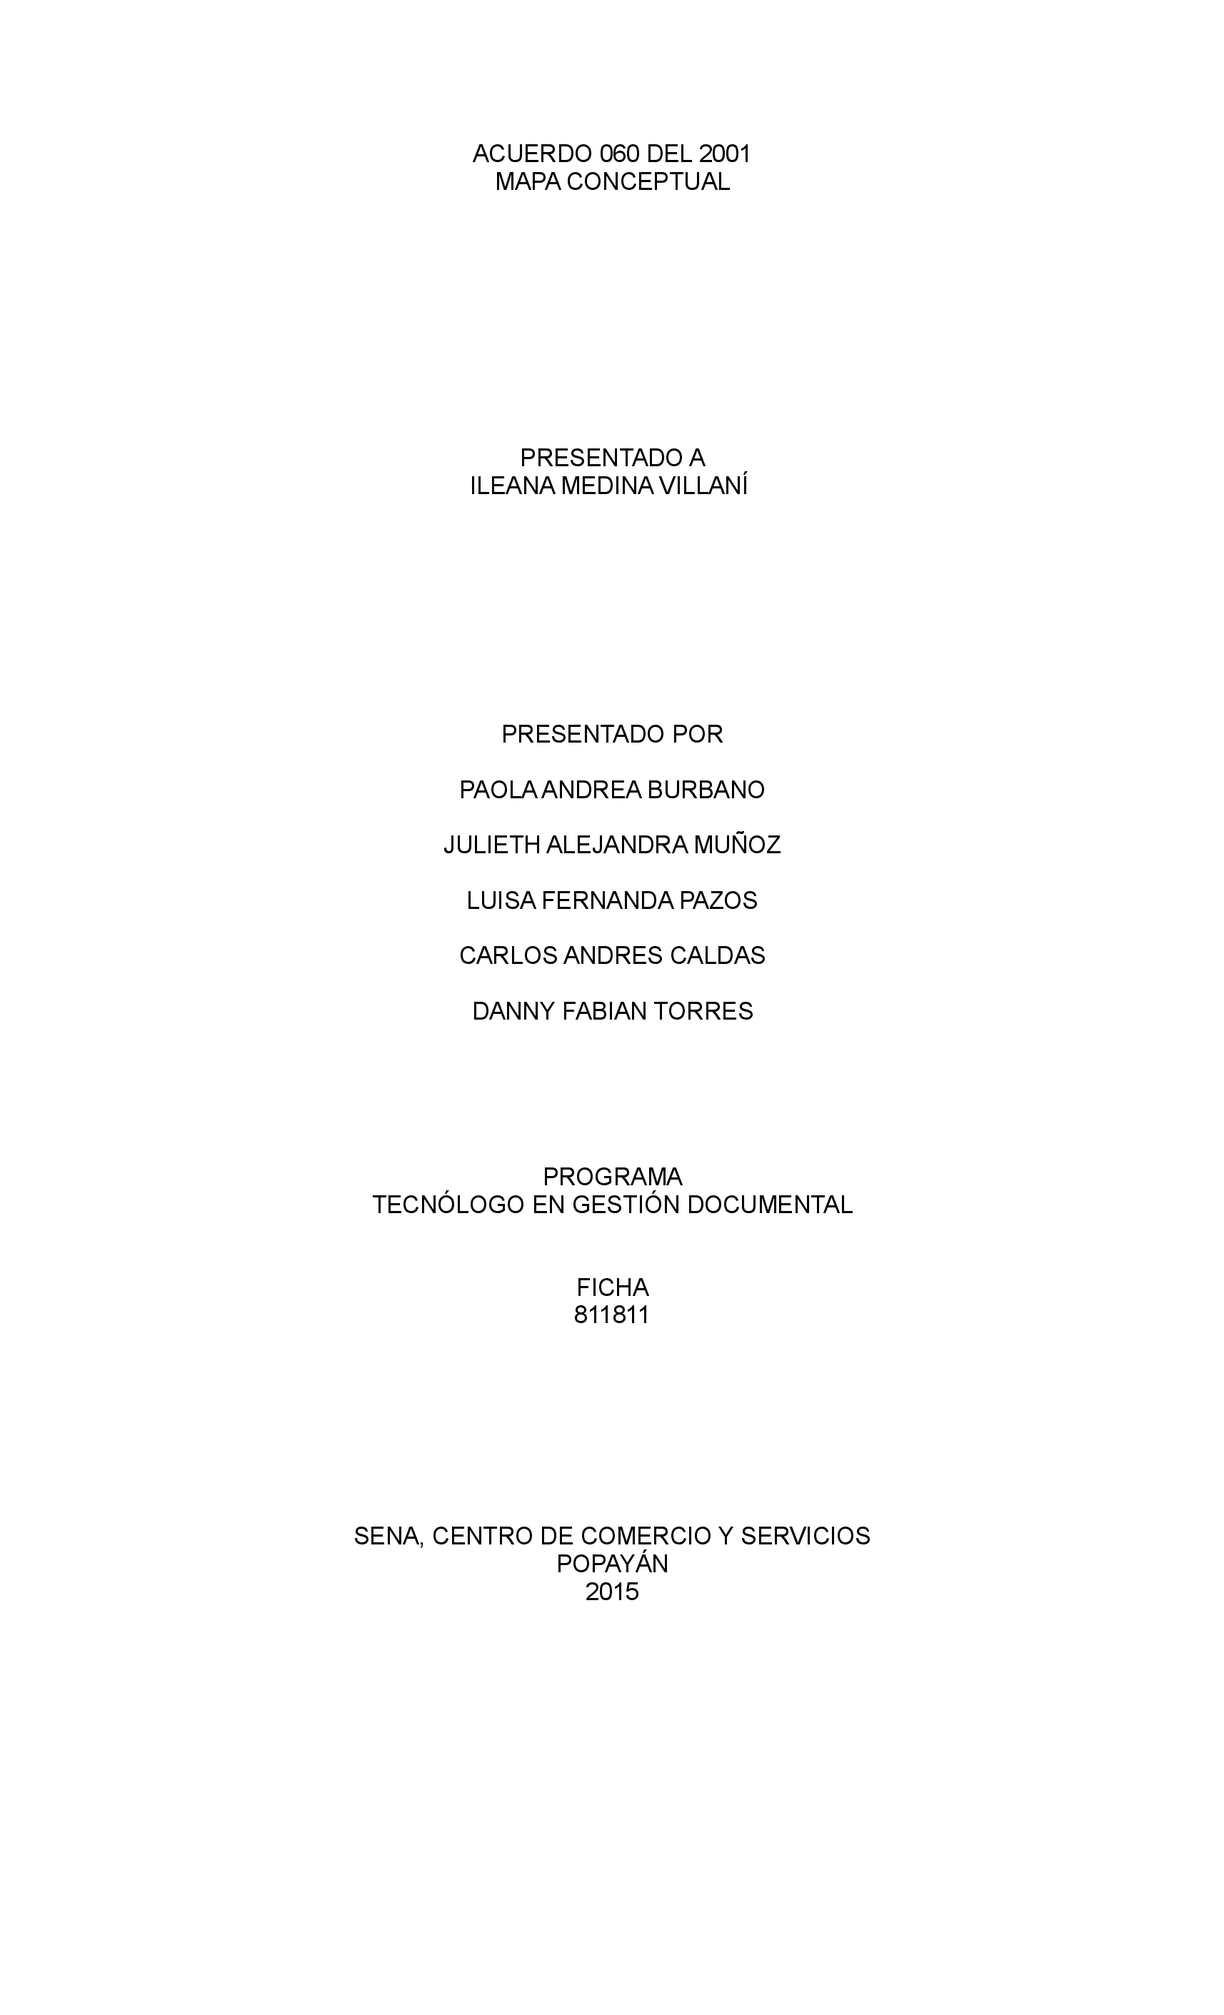 Acuerdo 060 - Mapa conceptual